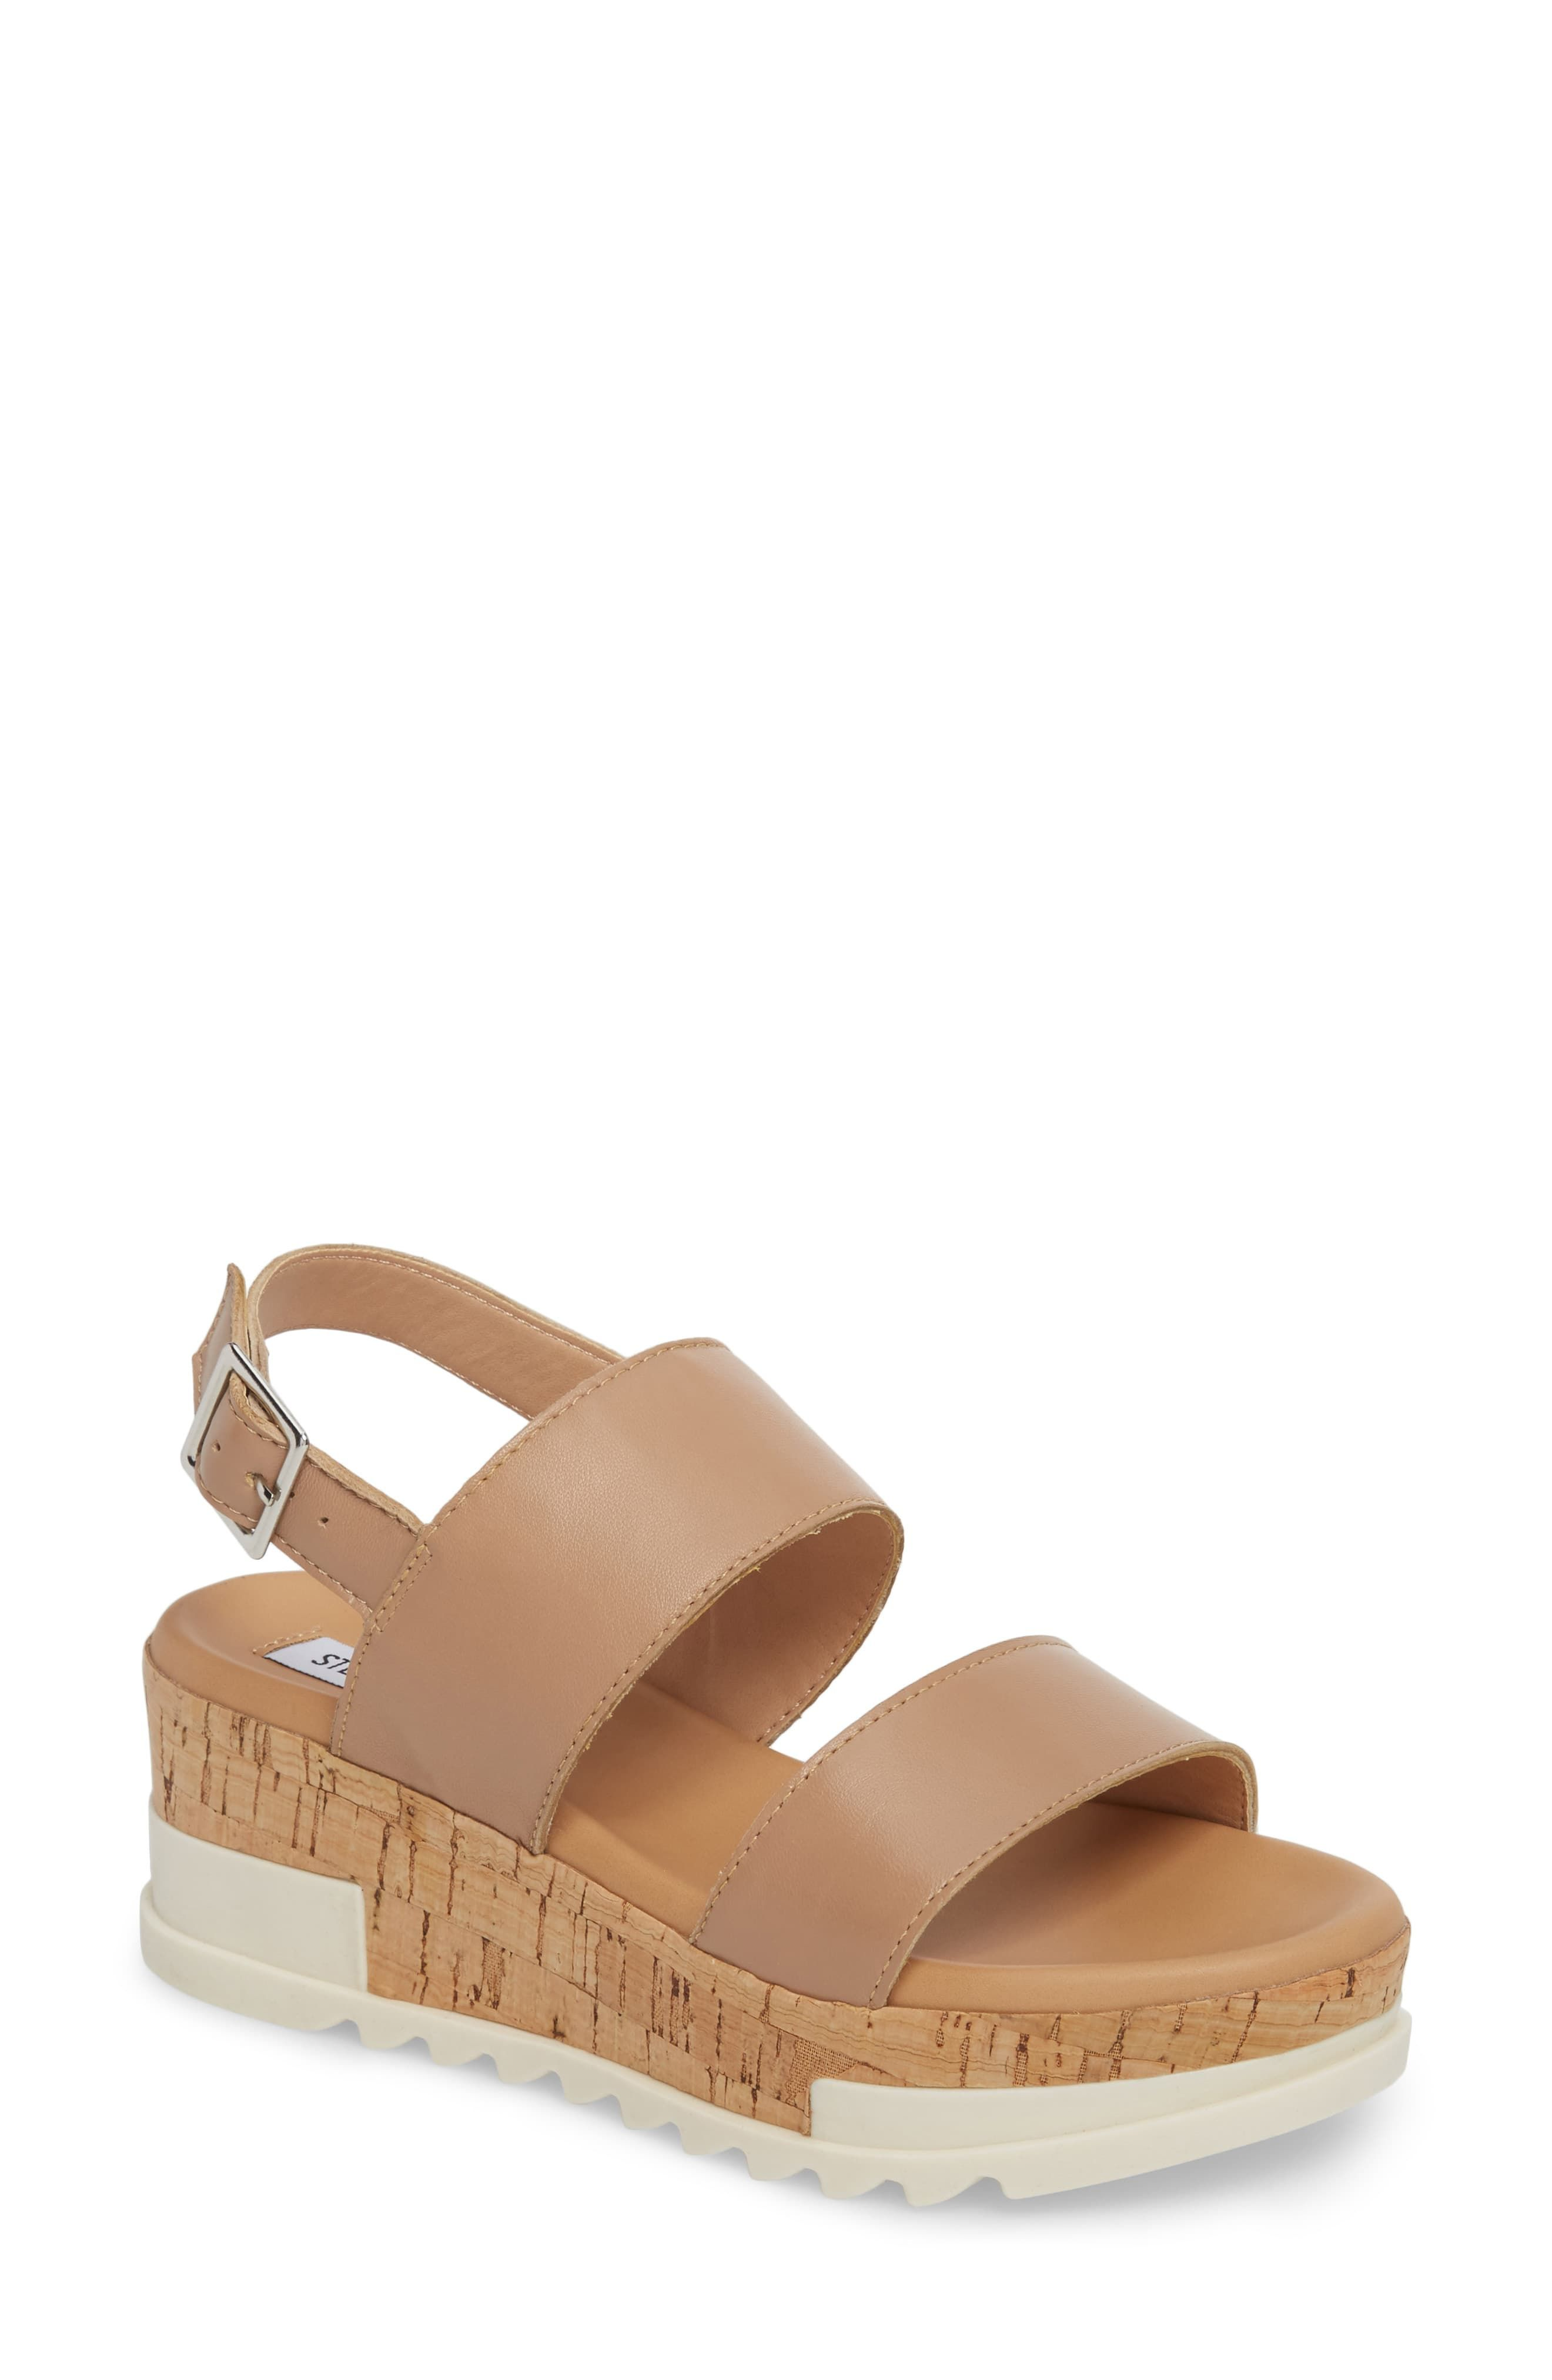 2680fc6d8b1 Steve Madden Brenda Wedge Sandal in 2019   Products   Wedge sandals ...